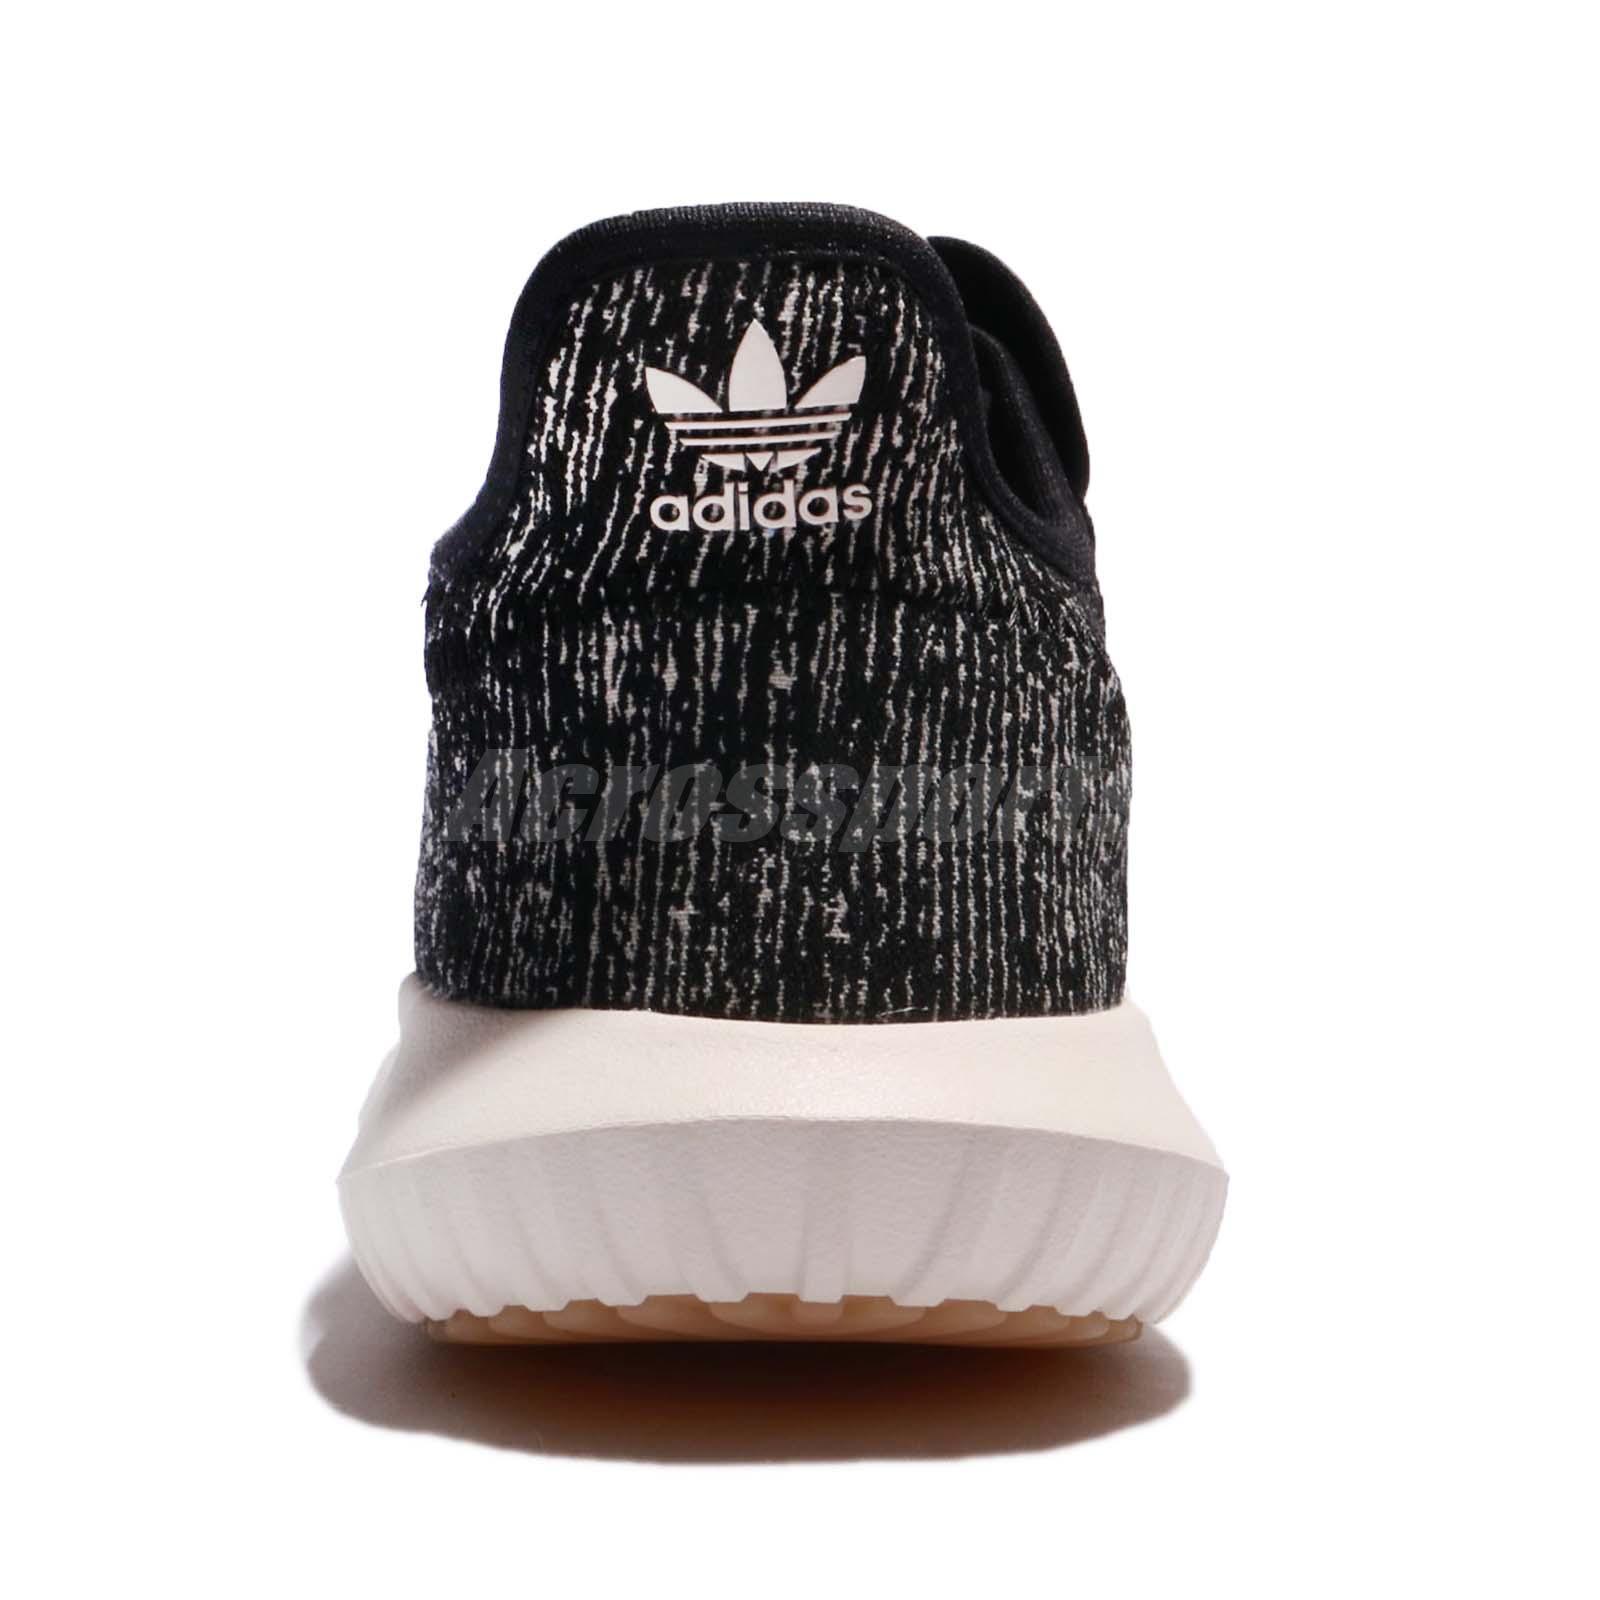 adidas Originals Tubular Shadow W Brown Black Women Running Shoes ... ba96de7b6